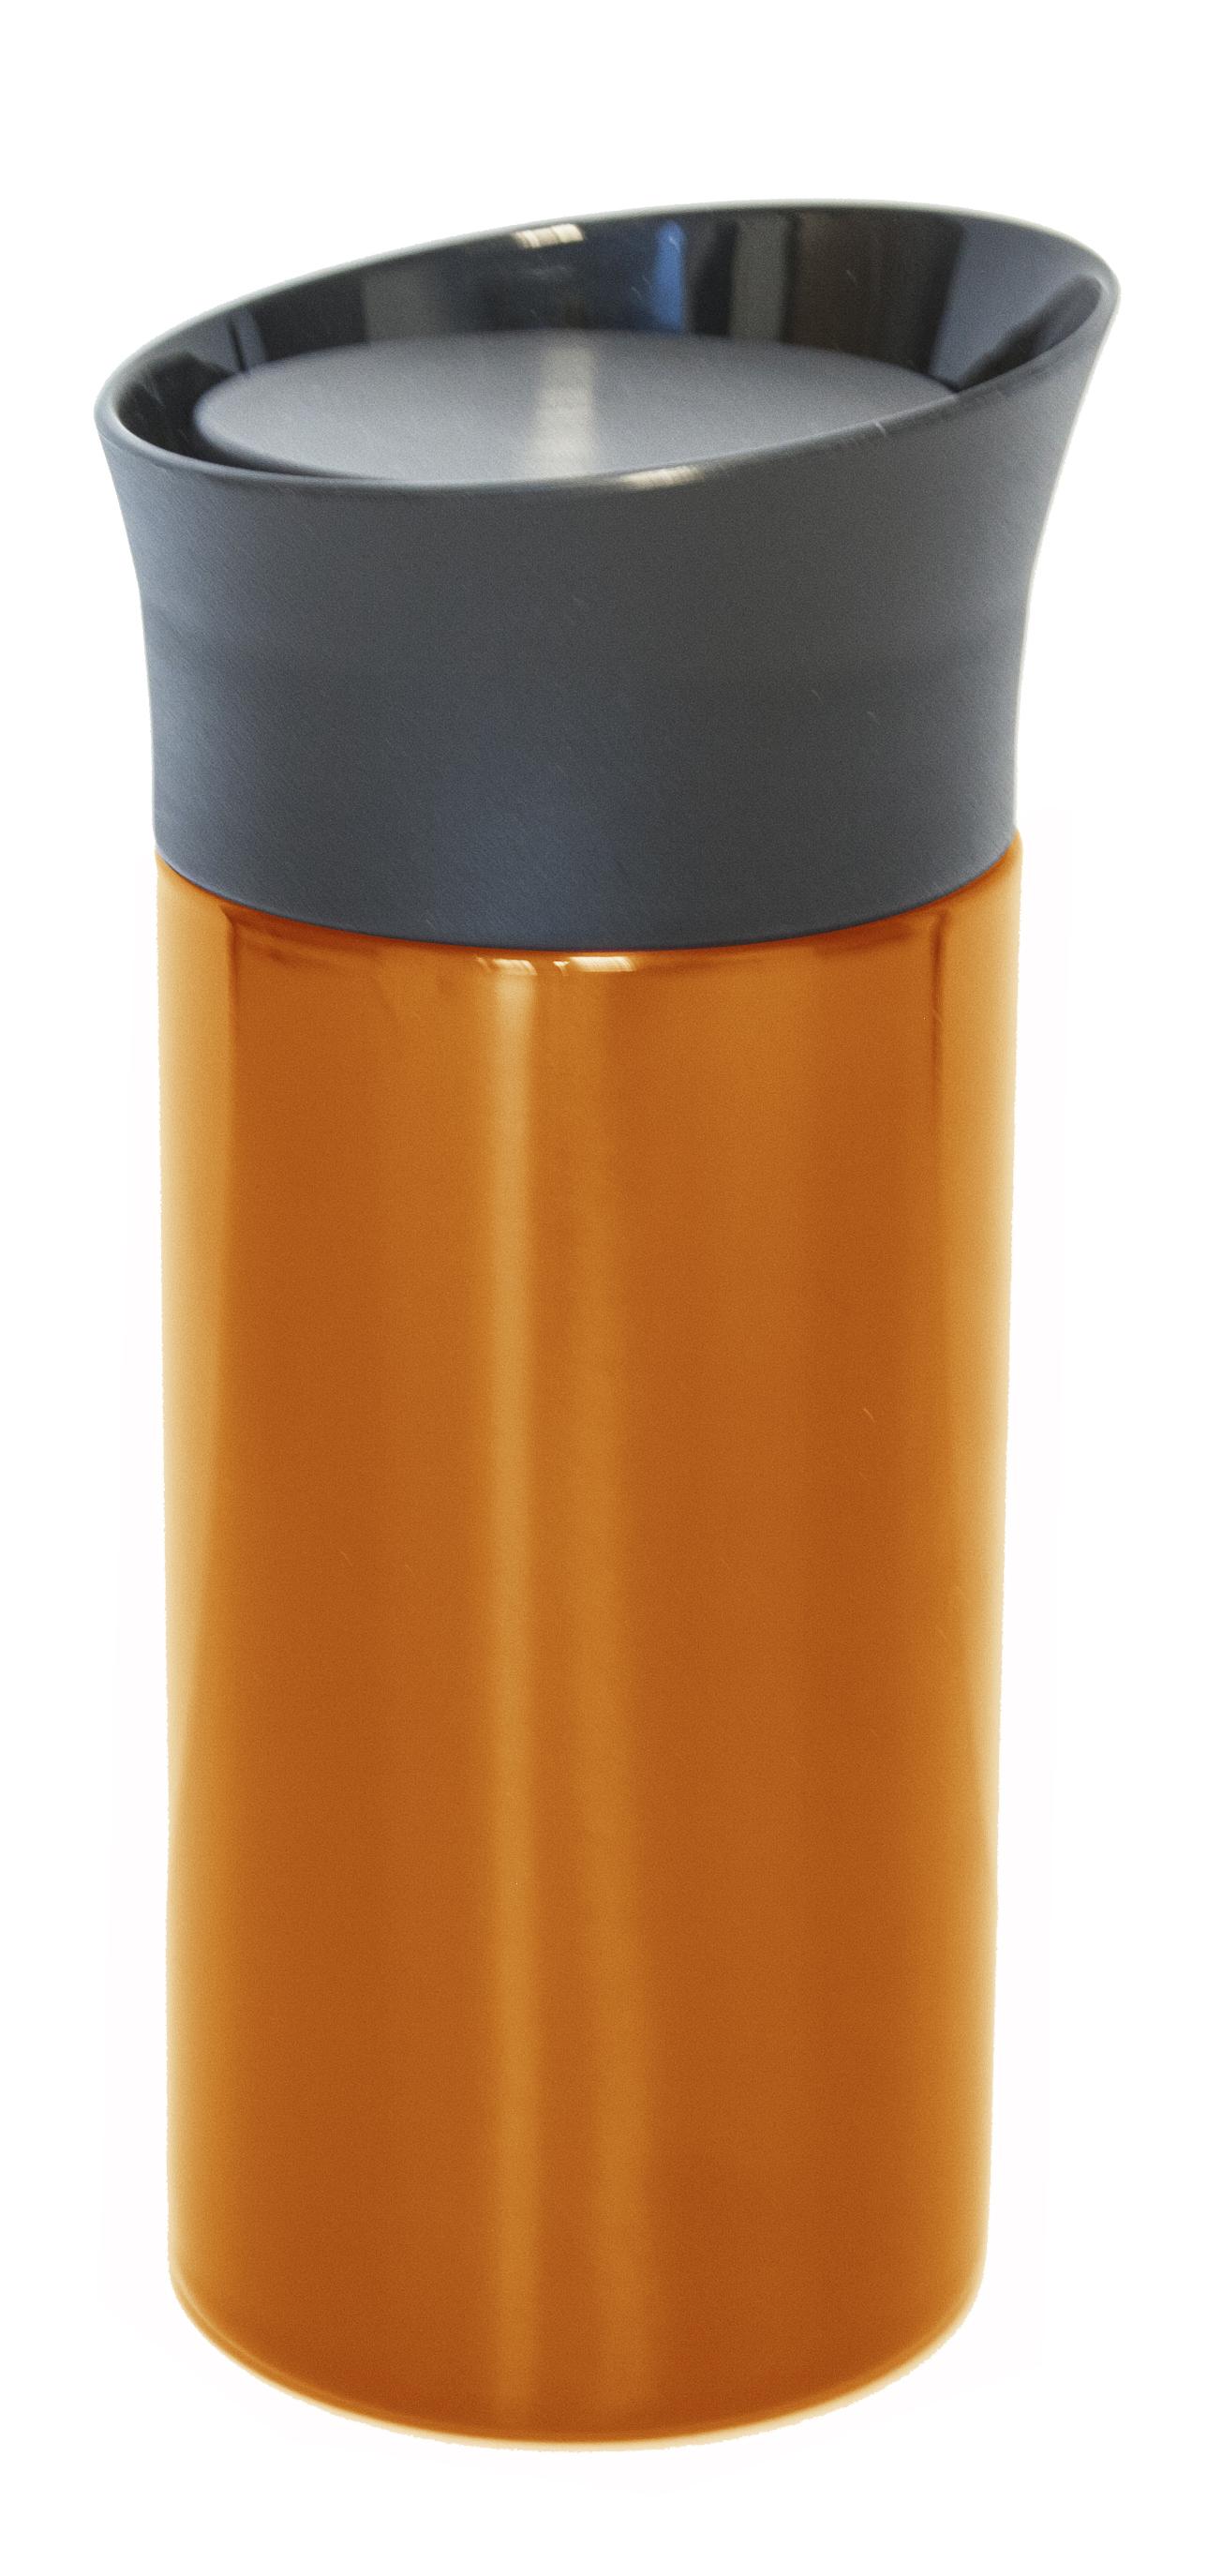 Bilmugg rak liten orange